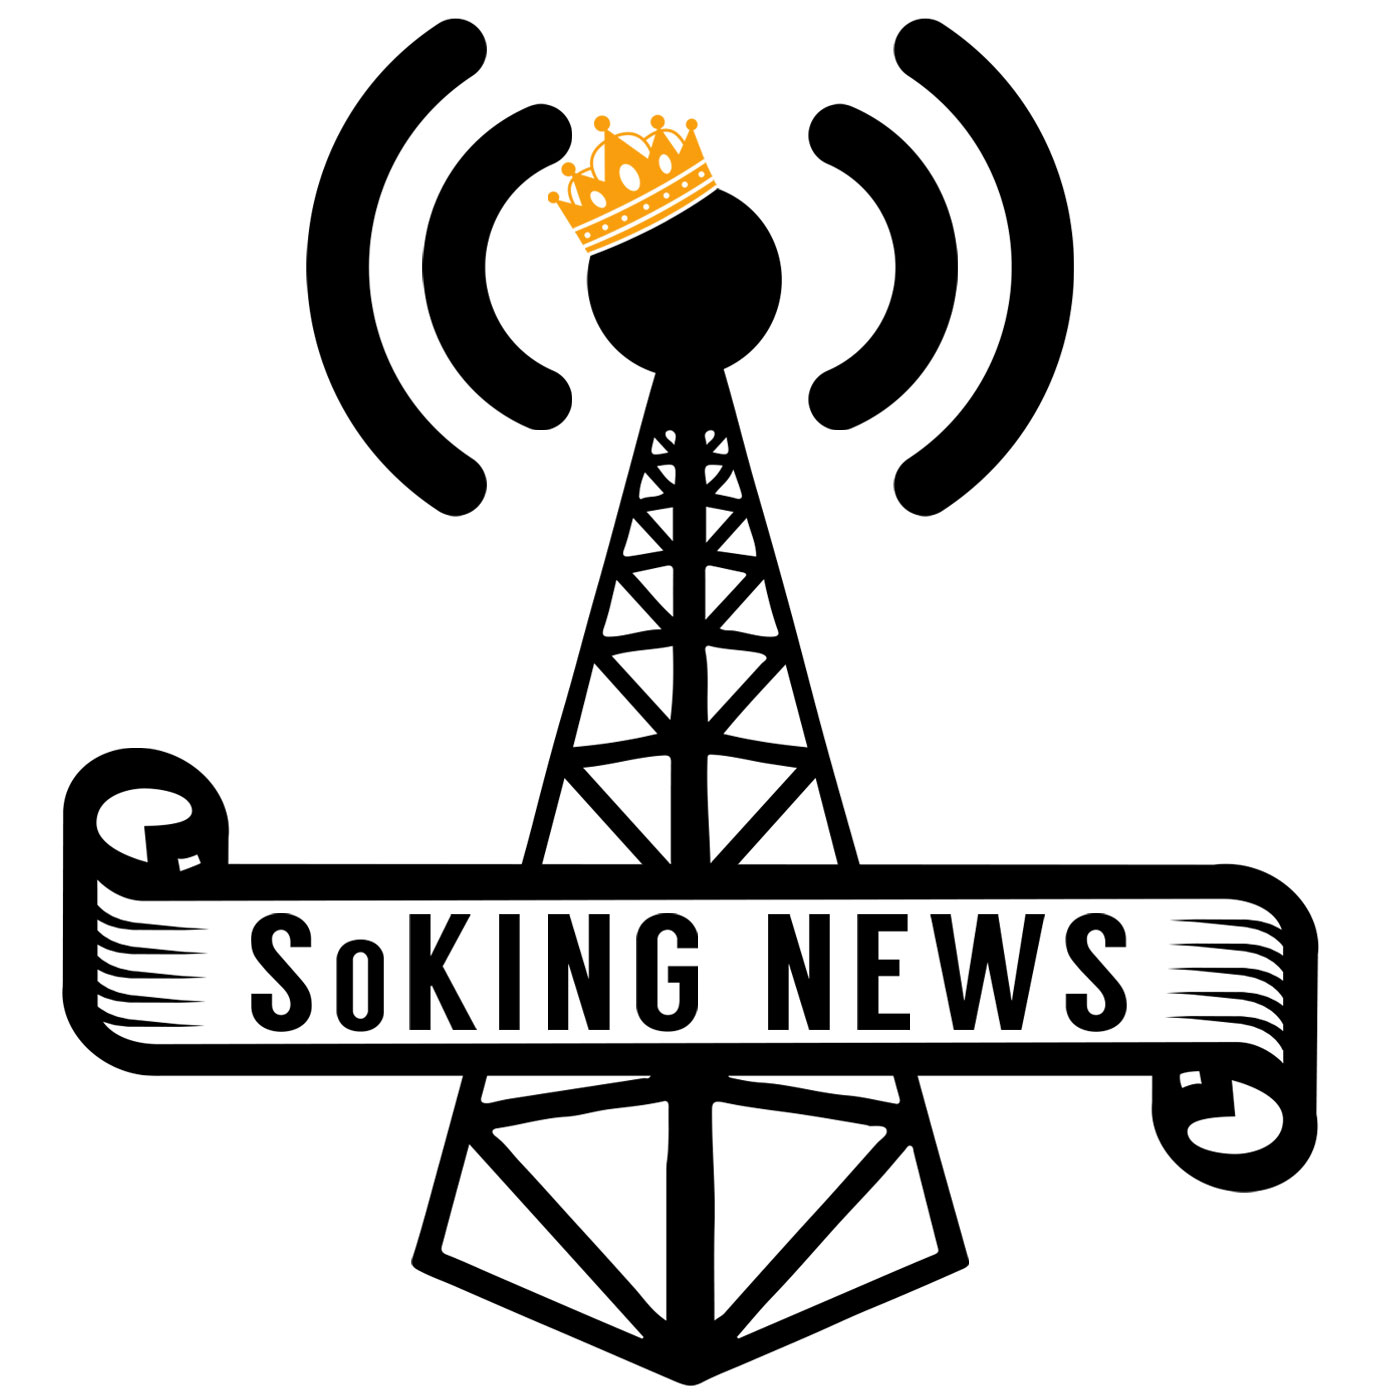 SoKing News